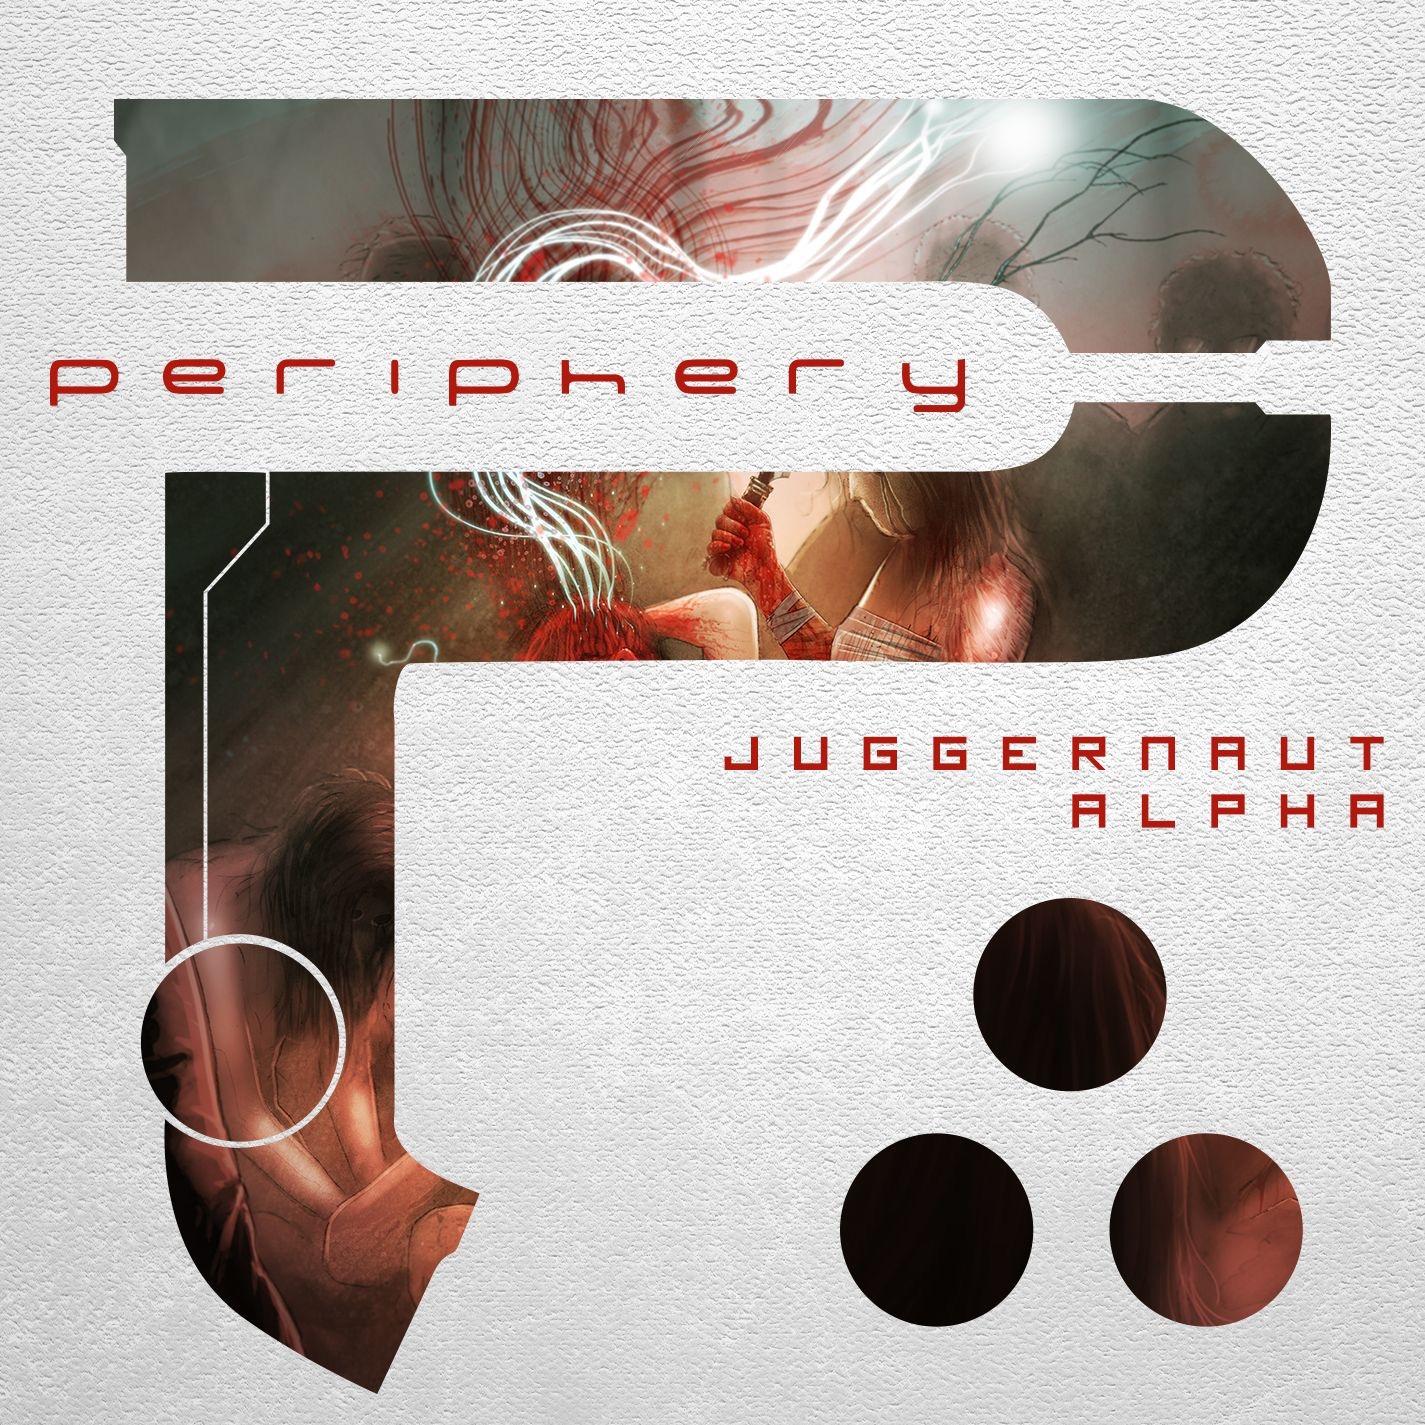 Periphery - Juggernaut: Alpha (2015)